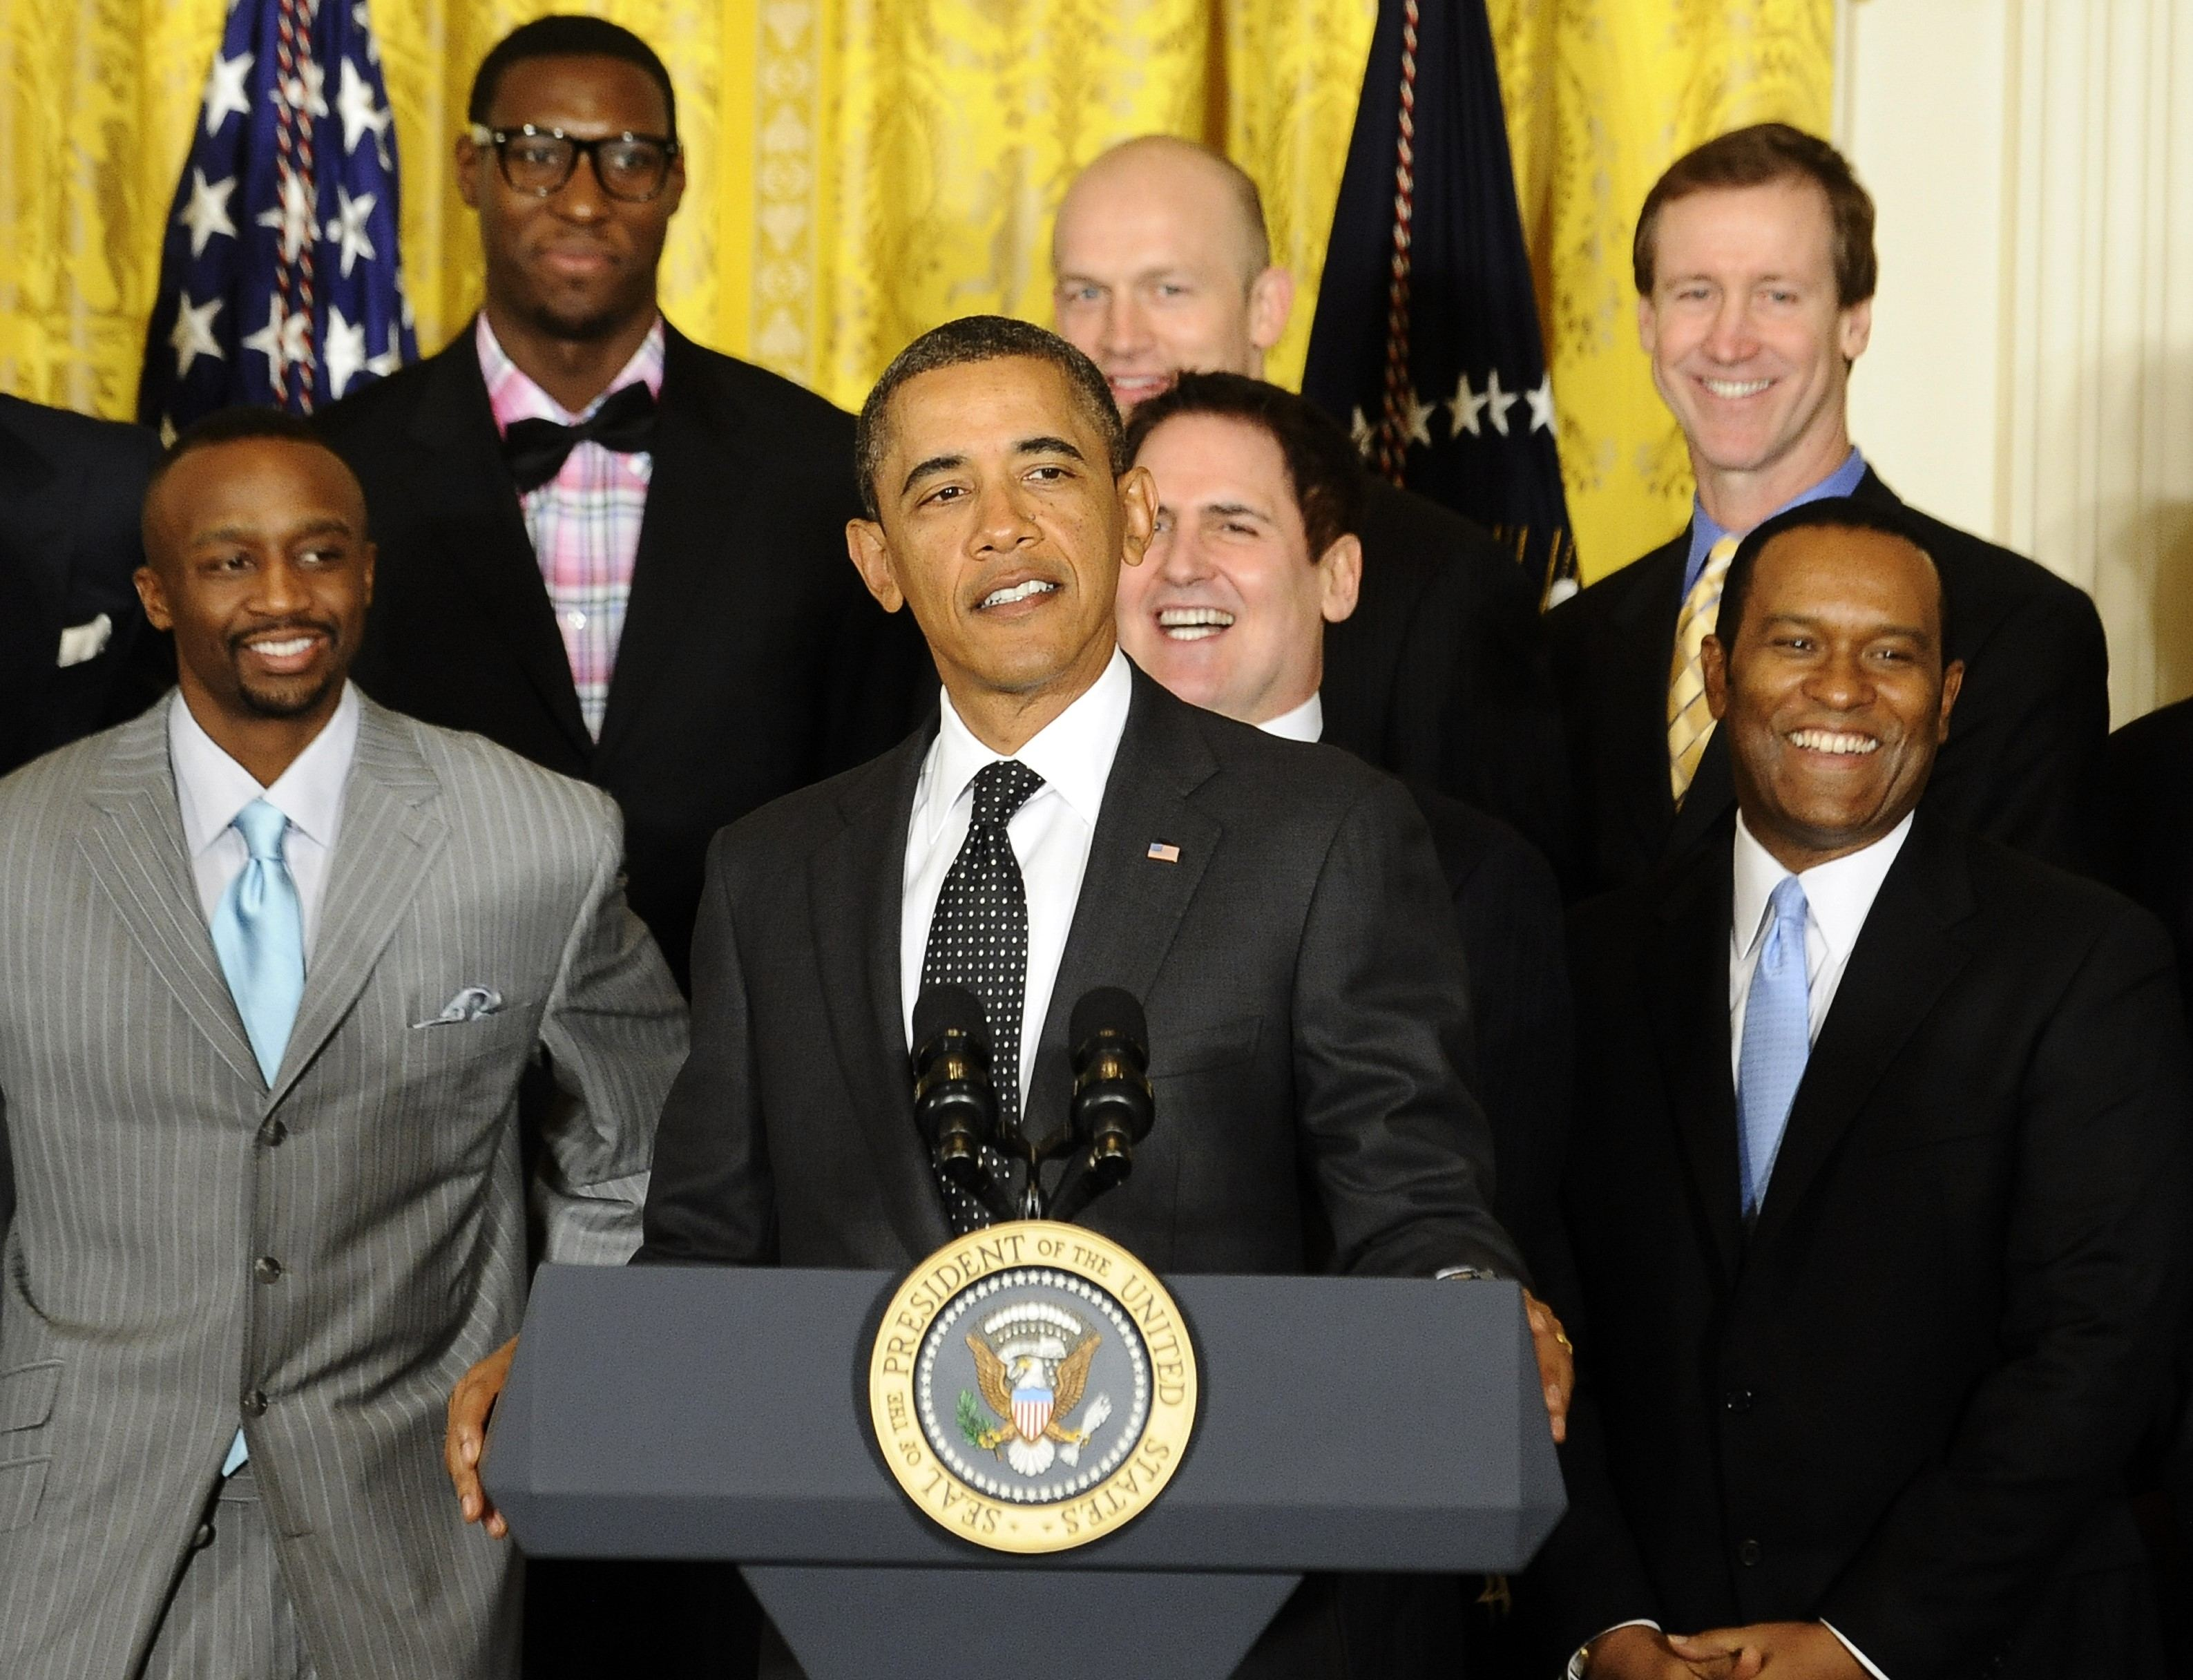 US President Barack Obama (C) speaks during Dallas Mavericks championship event